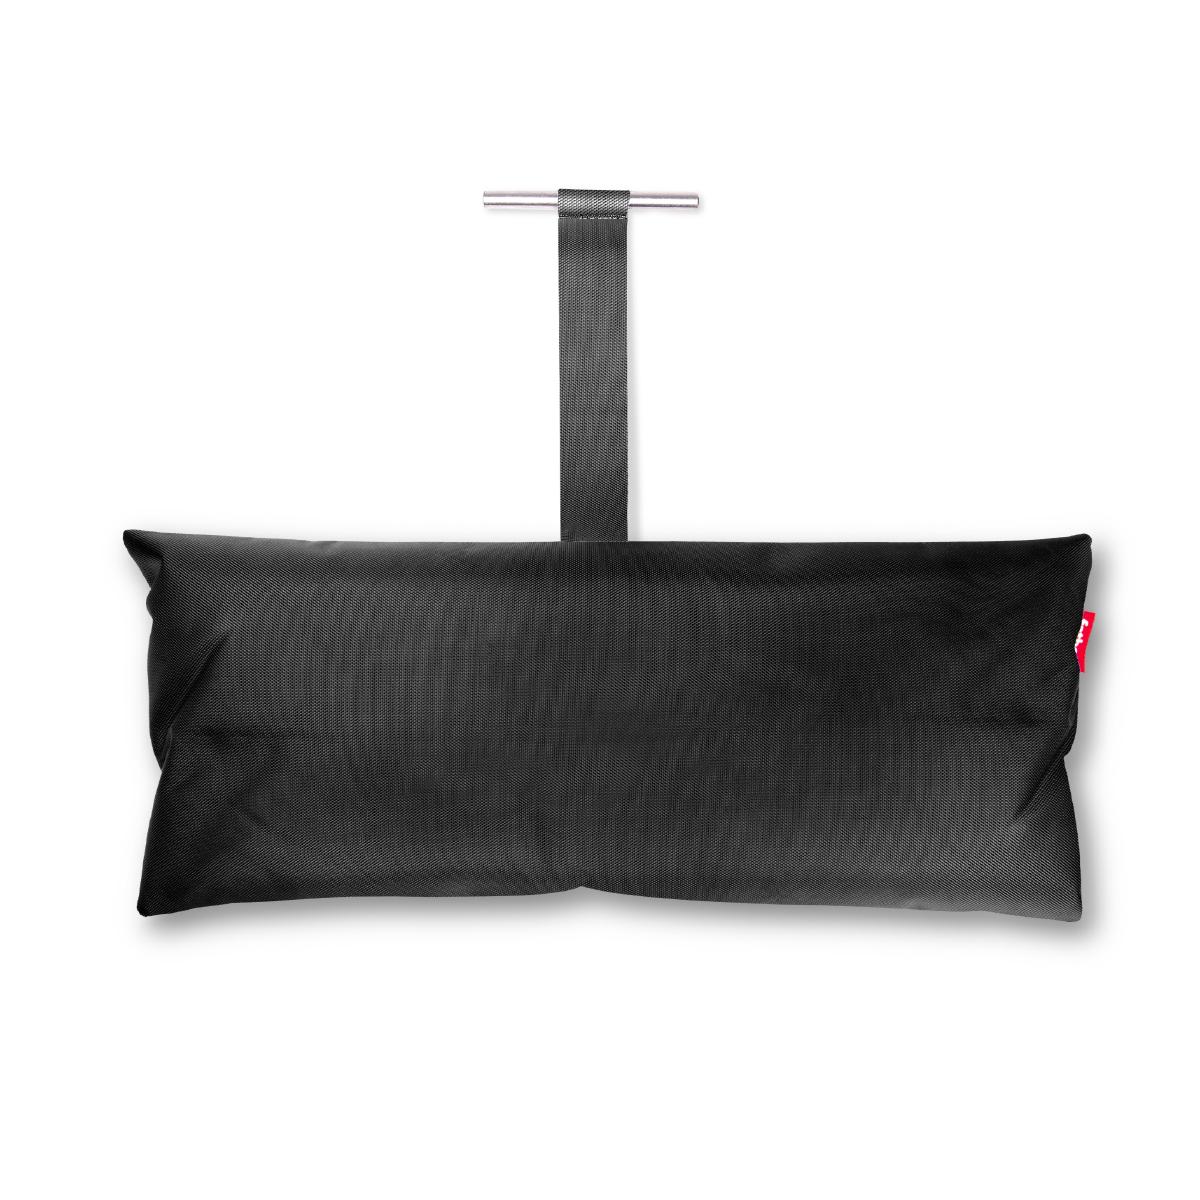 Fatboy Headdemock Pillow Black